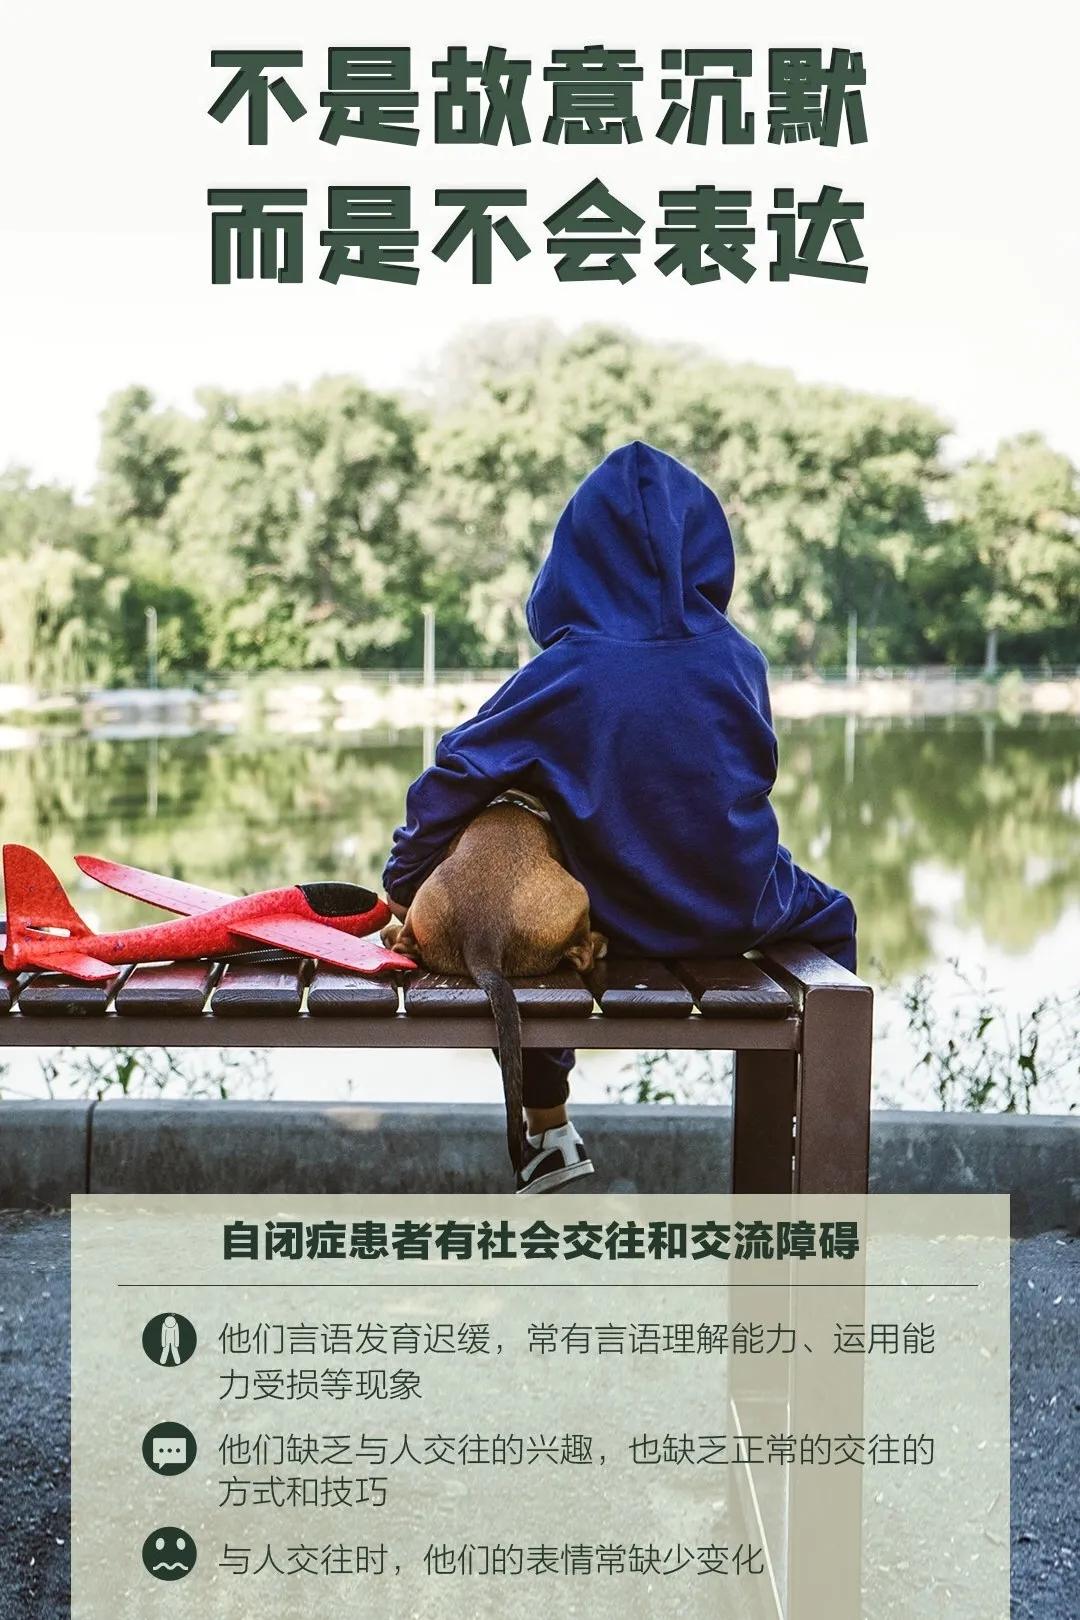 https://level8cases.oss-cn-hangzhou.aliyuncs.com/640.webp(2)-a28cf44f-ac40-4c02-a3a9-3ea682936904.jpg